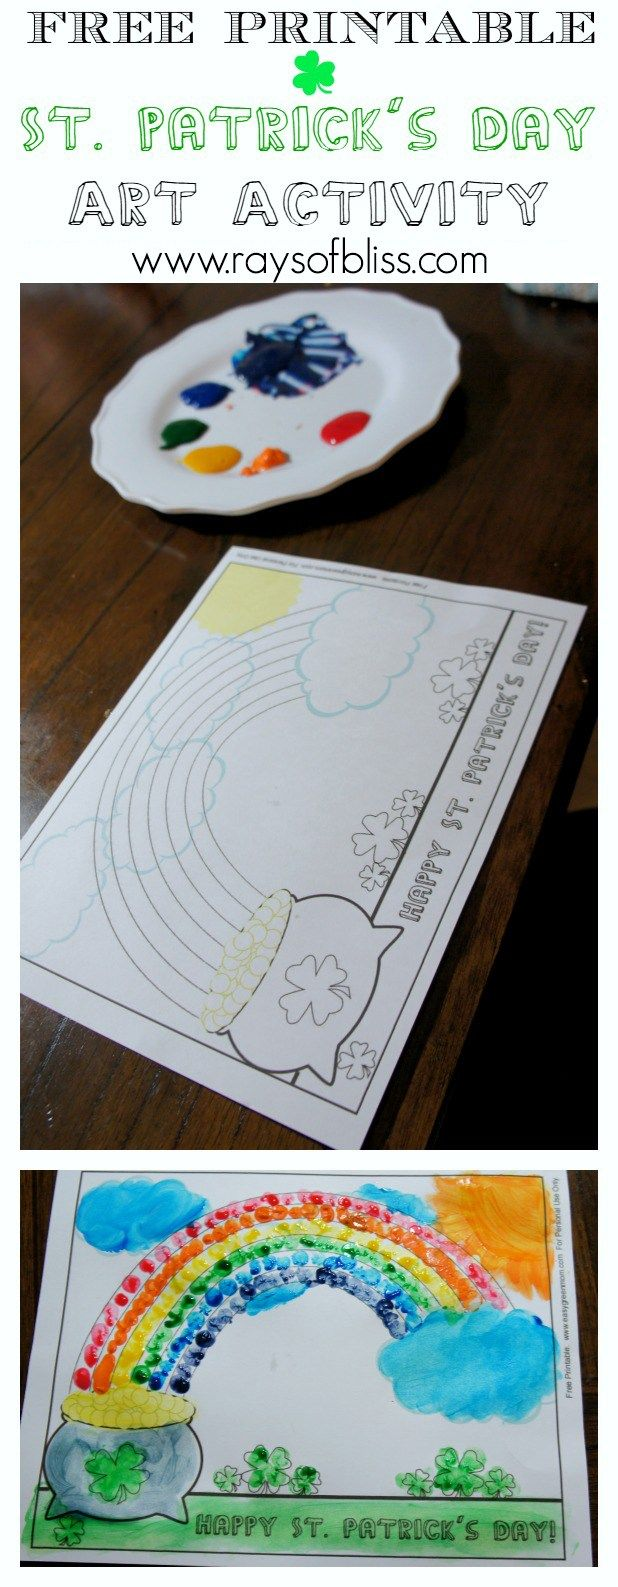 St Patrick s Day Art Activity Free Printable